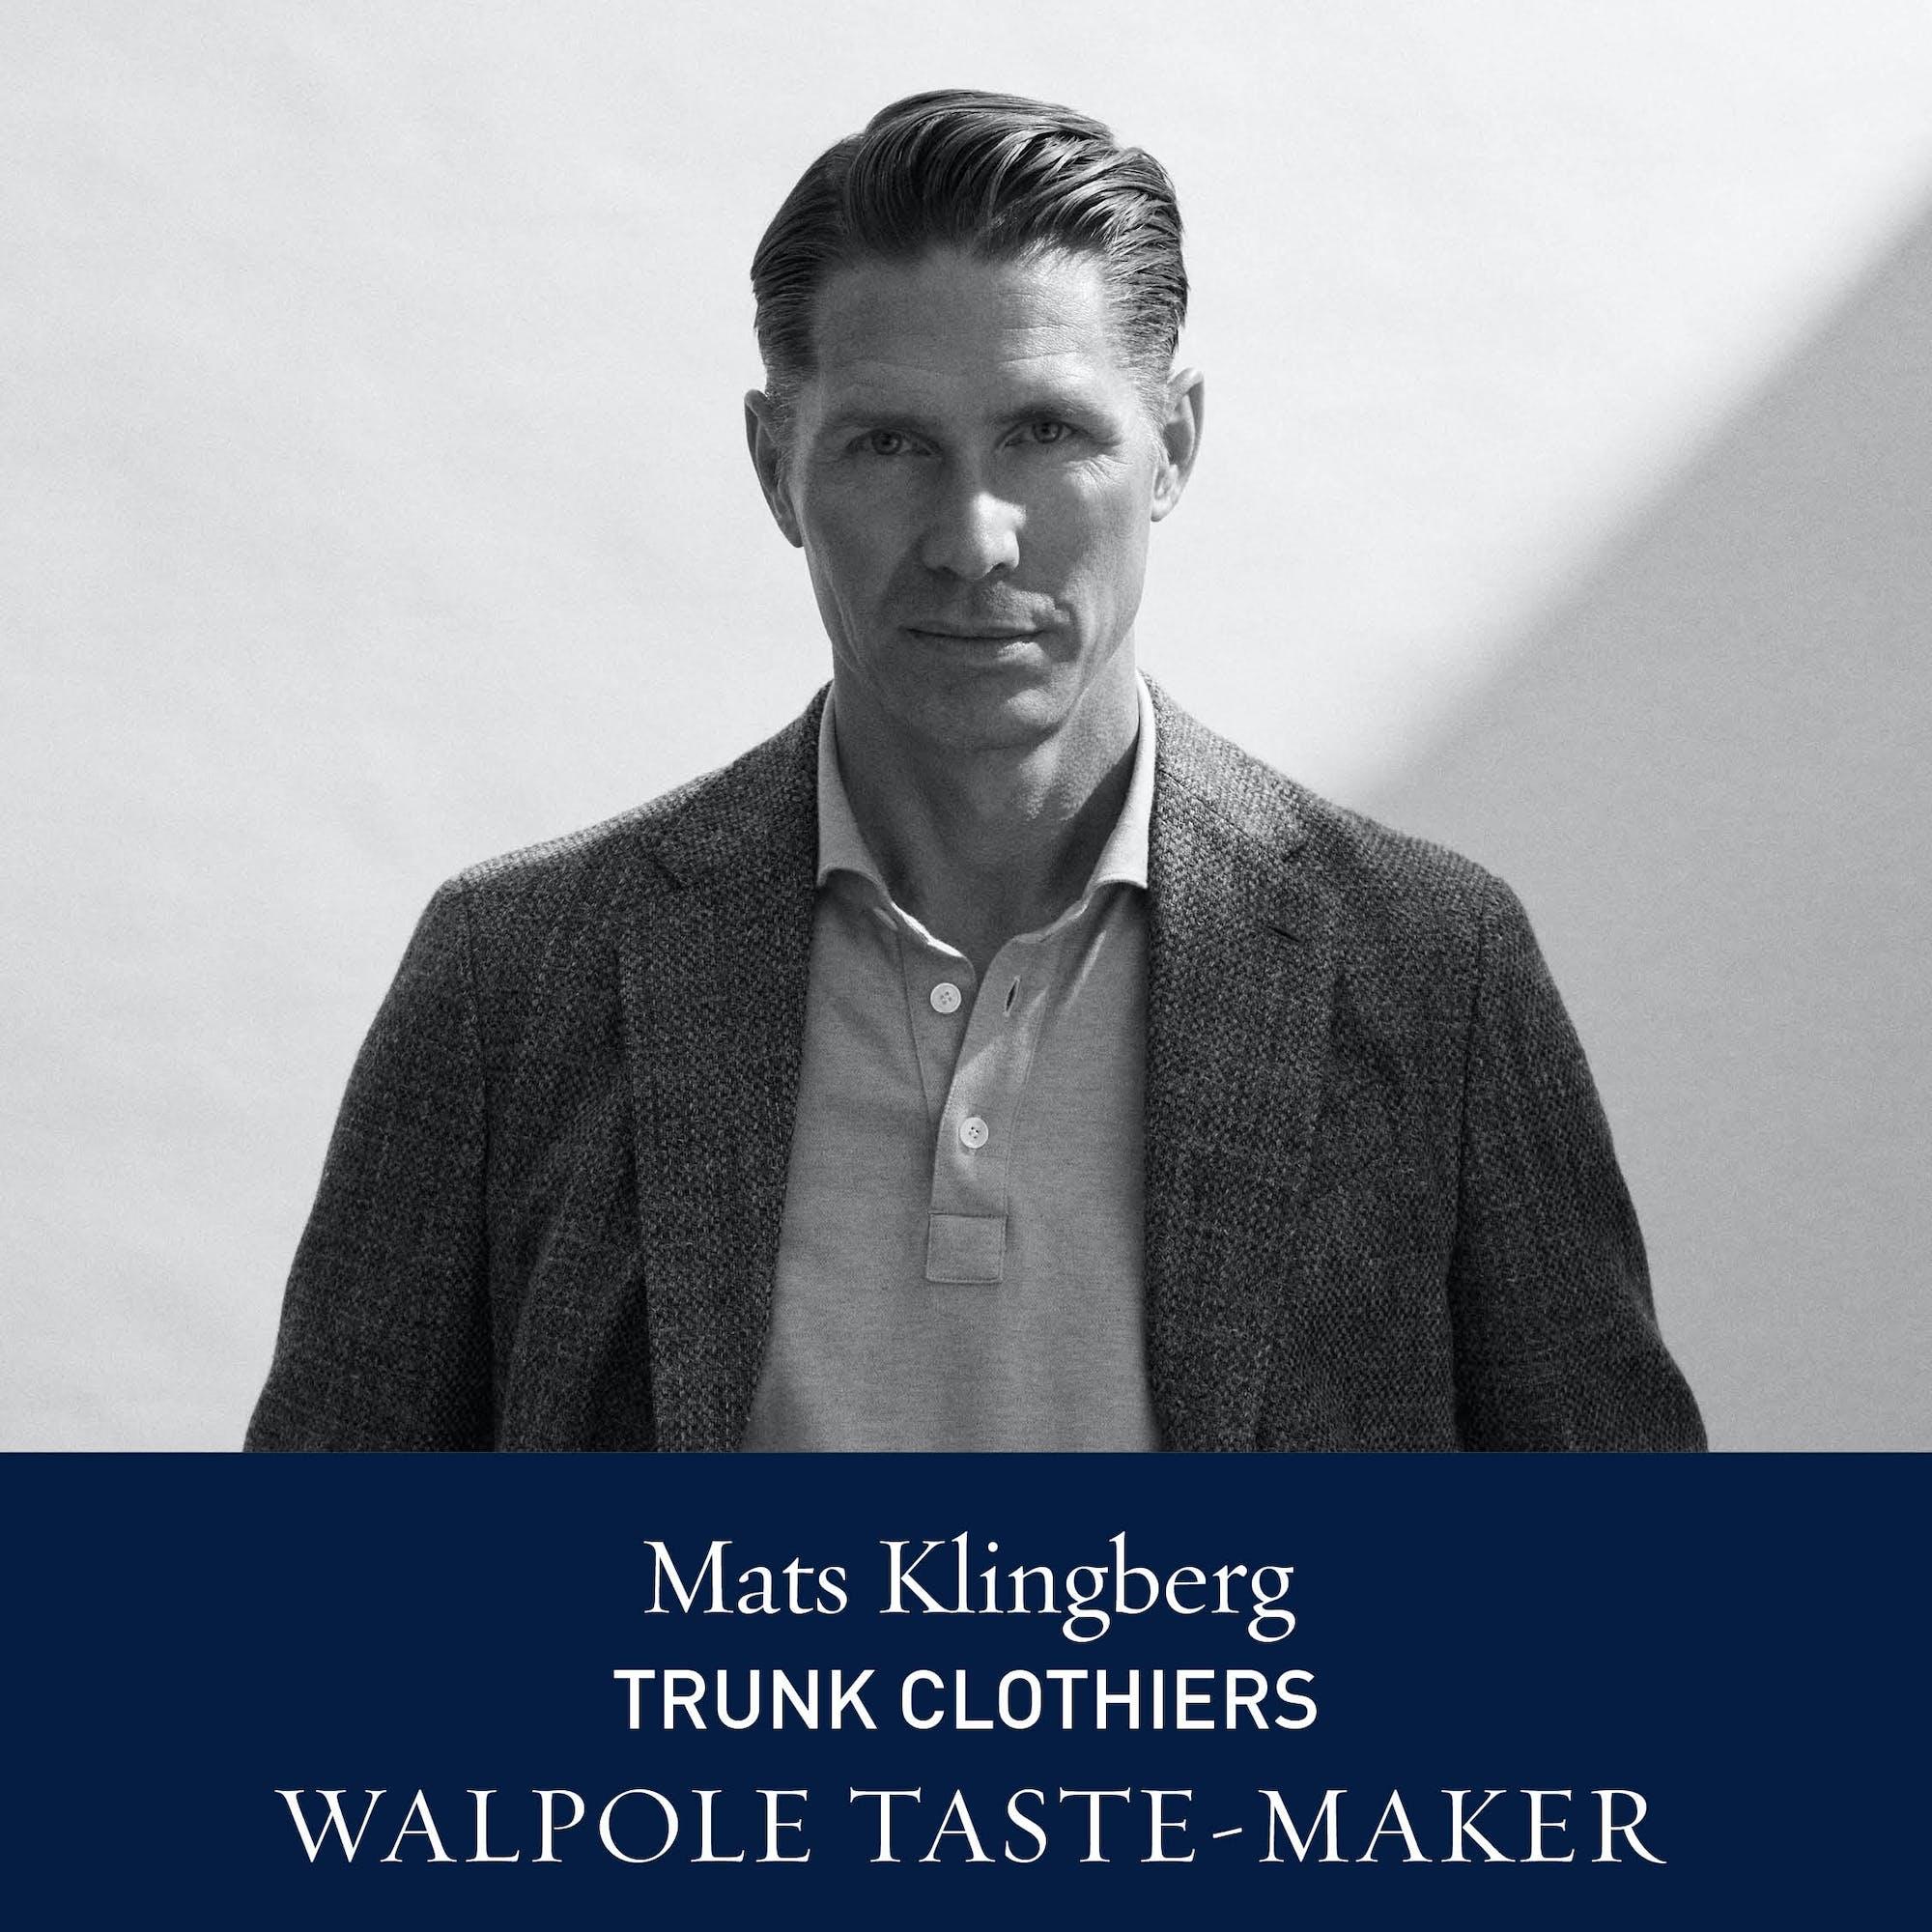 The Walpole Power List 2020  The Taste-Makers: Mats Klinberg, Founder, Trunk Clothiers